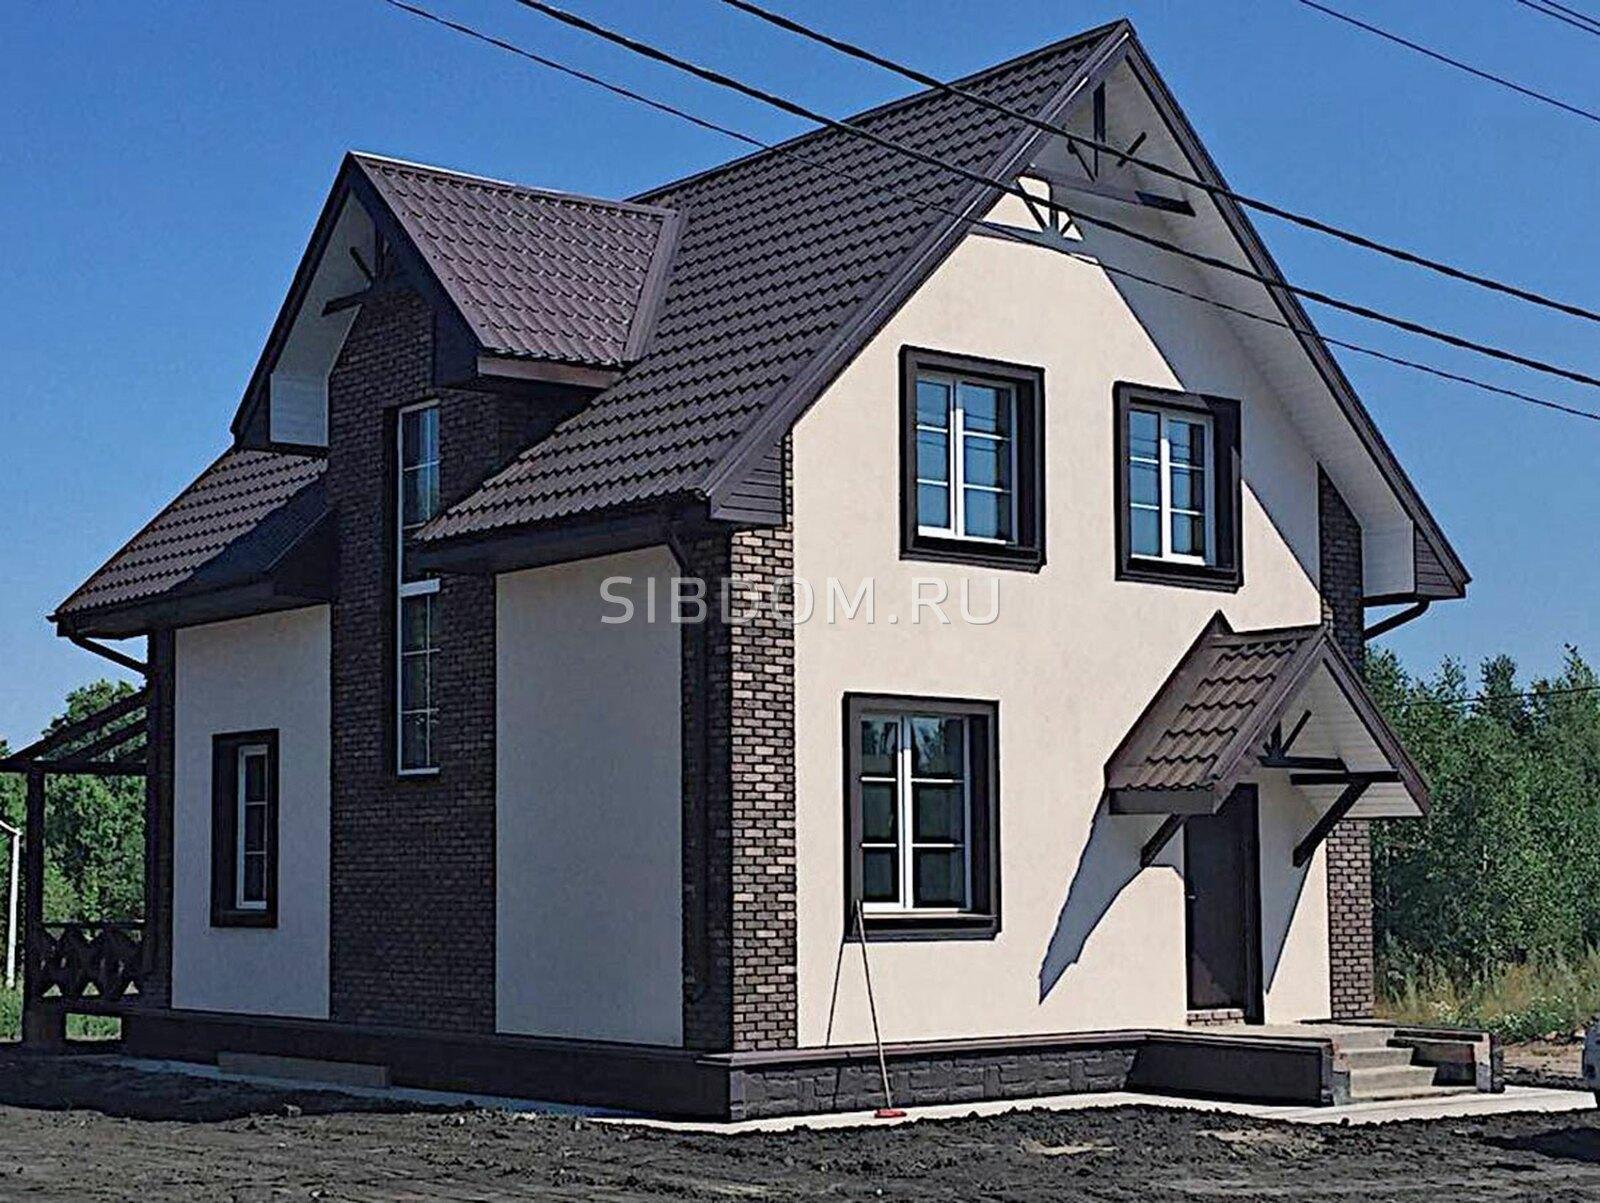 Продажа недвижимости в скандинавии купон дубай